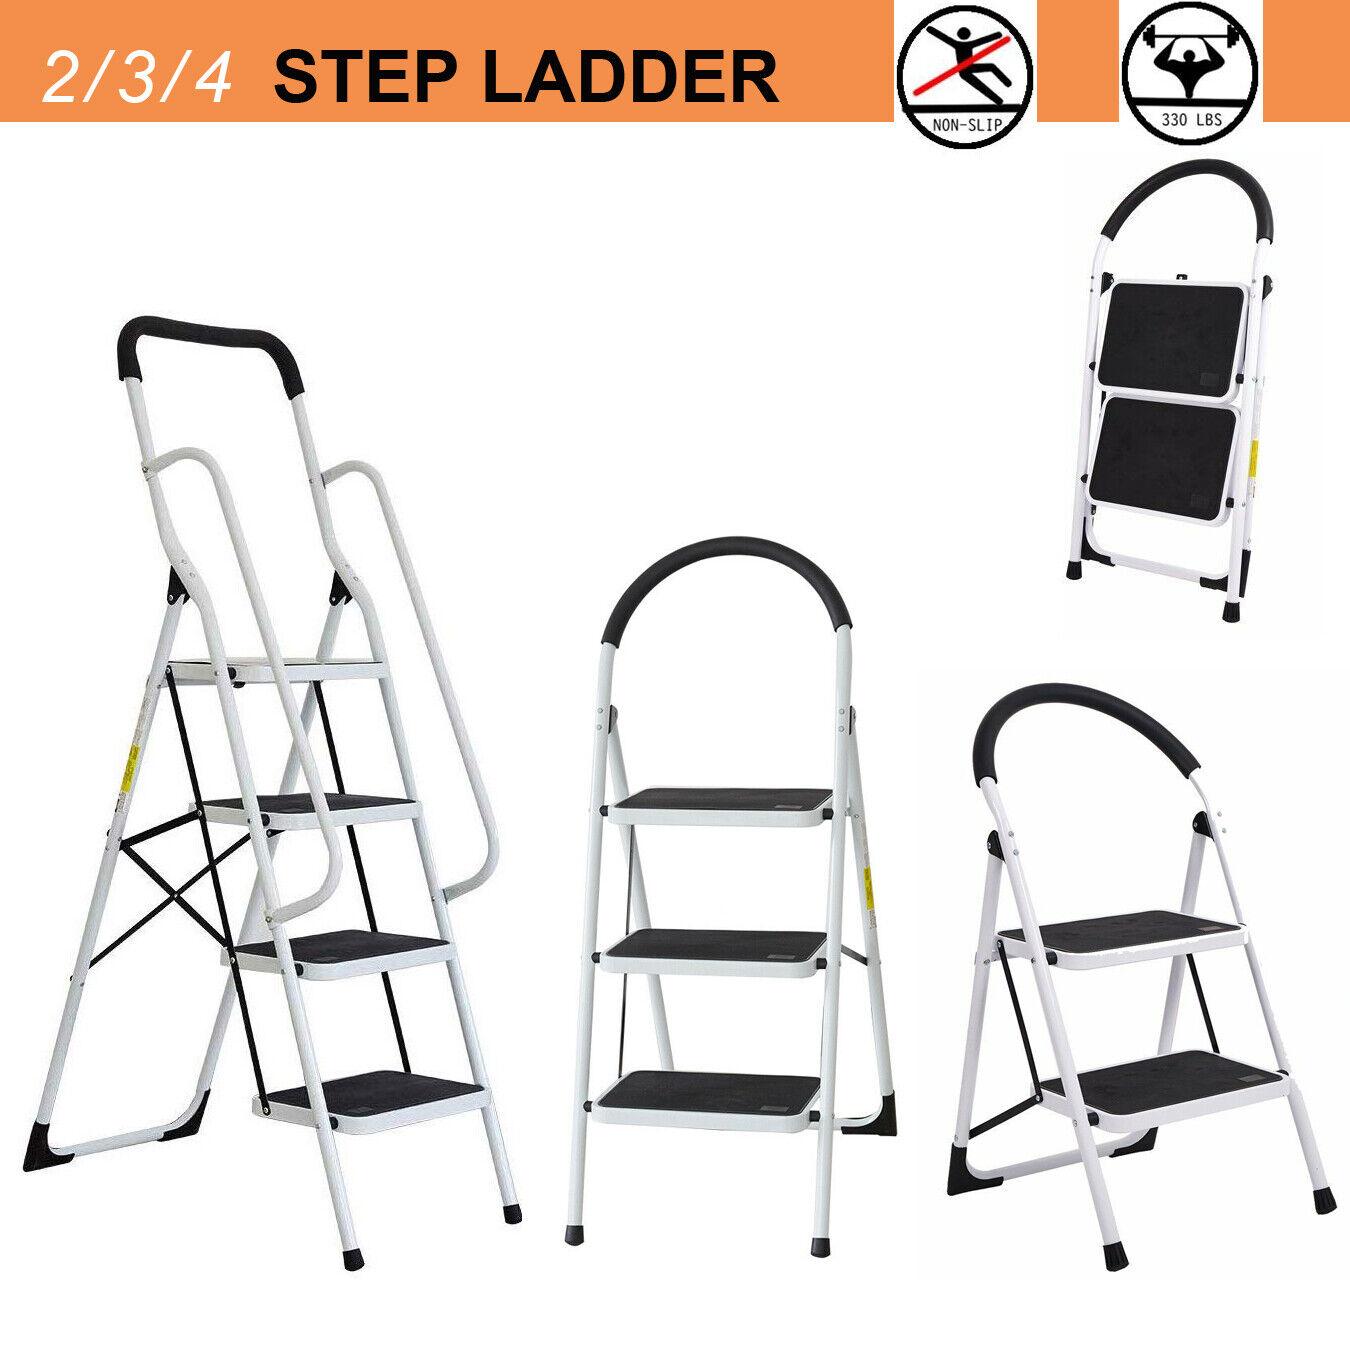 2 3 4 step ladder folding stool